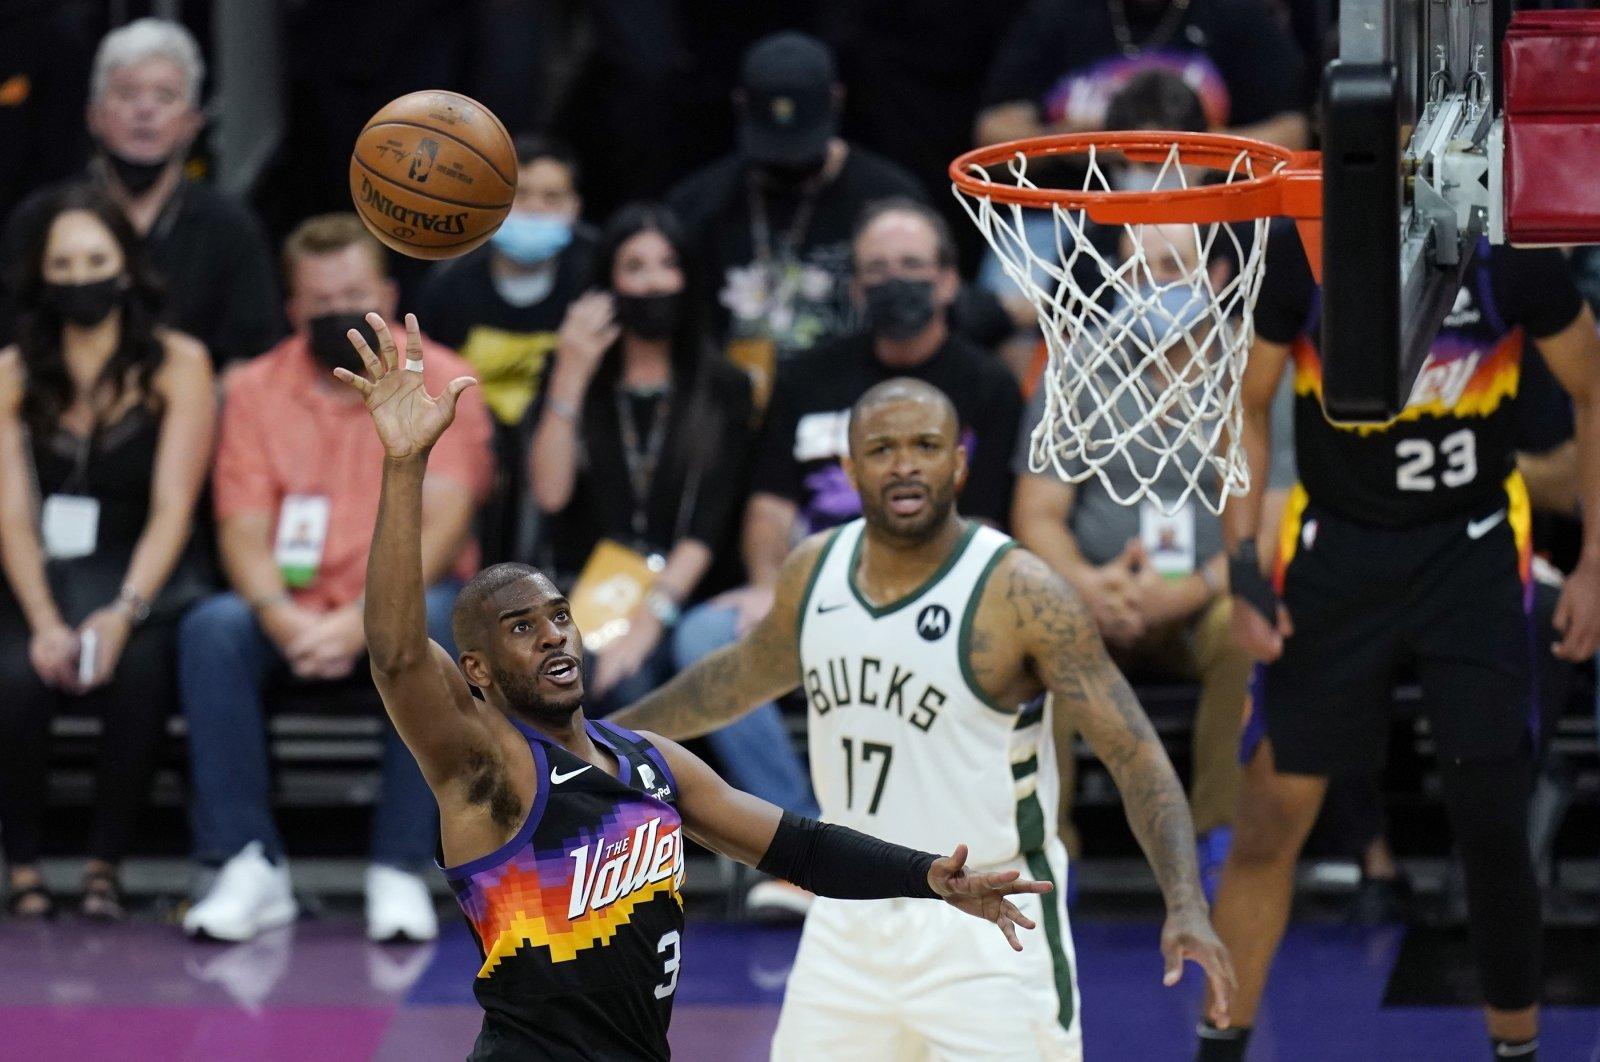 Phoenix Suns guard Chris Paul (L) scores as Milwaukee Bucks forward P.J. Tucker (R) looks on during NBA Finals Game 1, Phoenix, Arizona, U.S., July 6, 2021. (AP Photo)